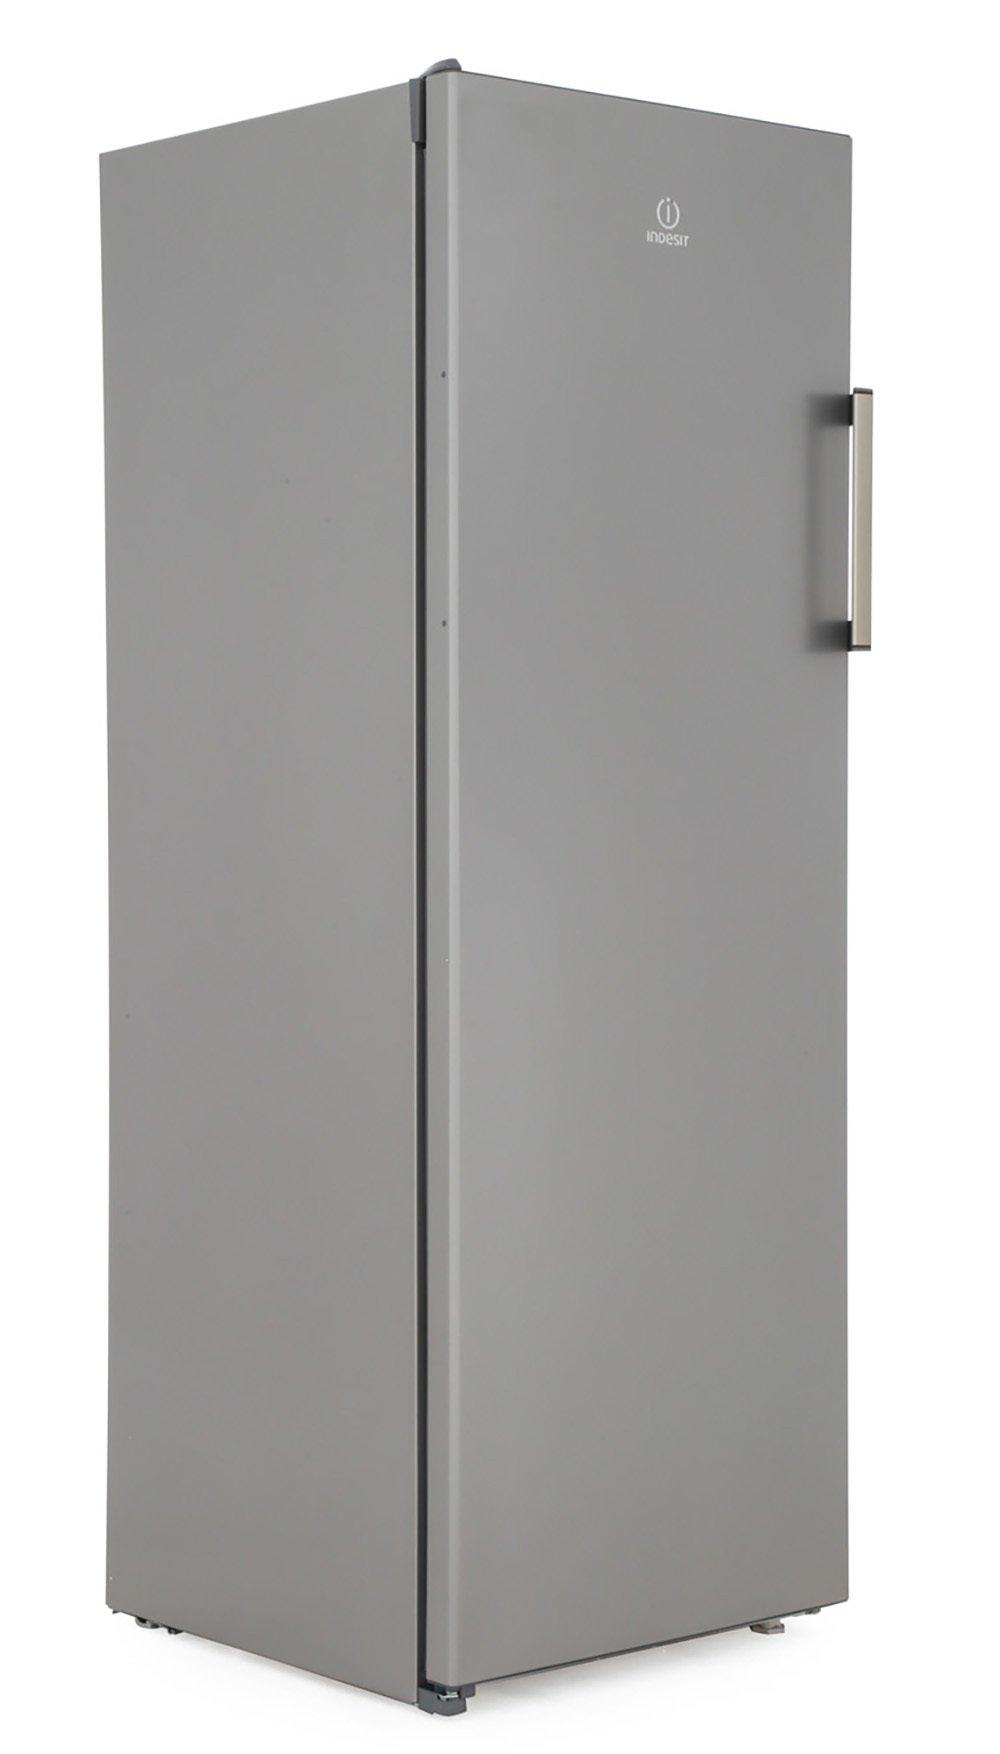 Indesit UI6 F1T S UK.1 Frost Free Tall Freezer